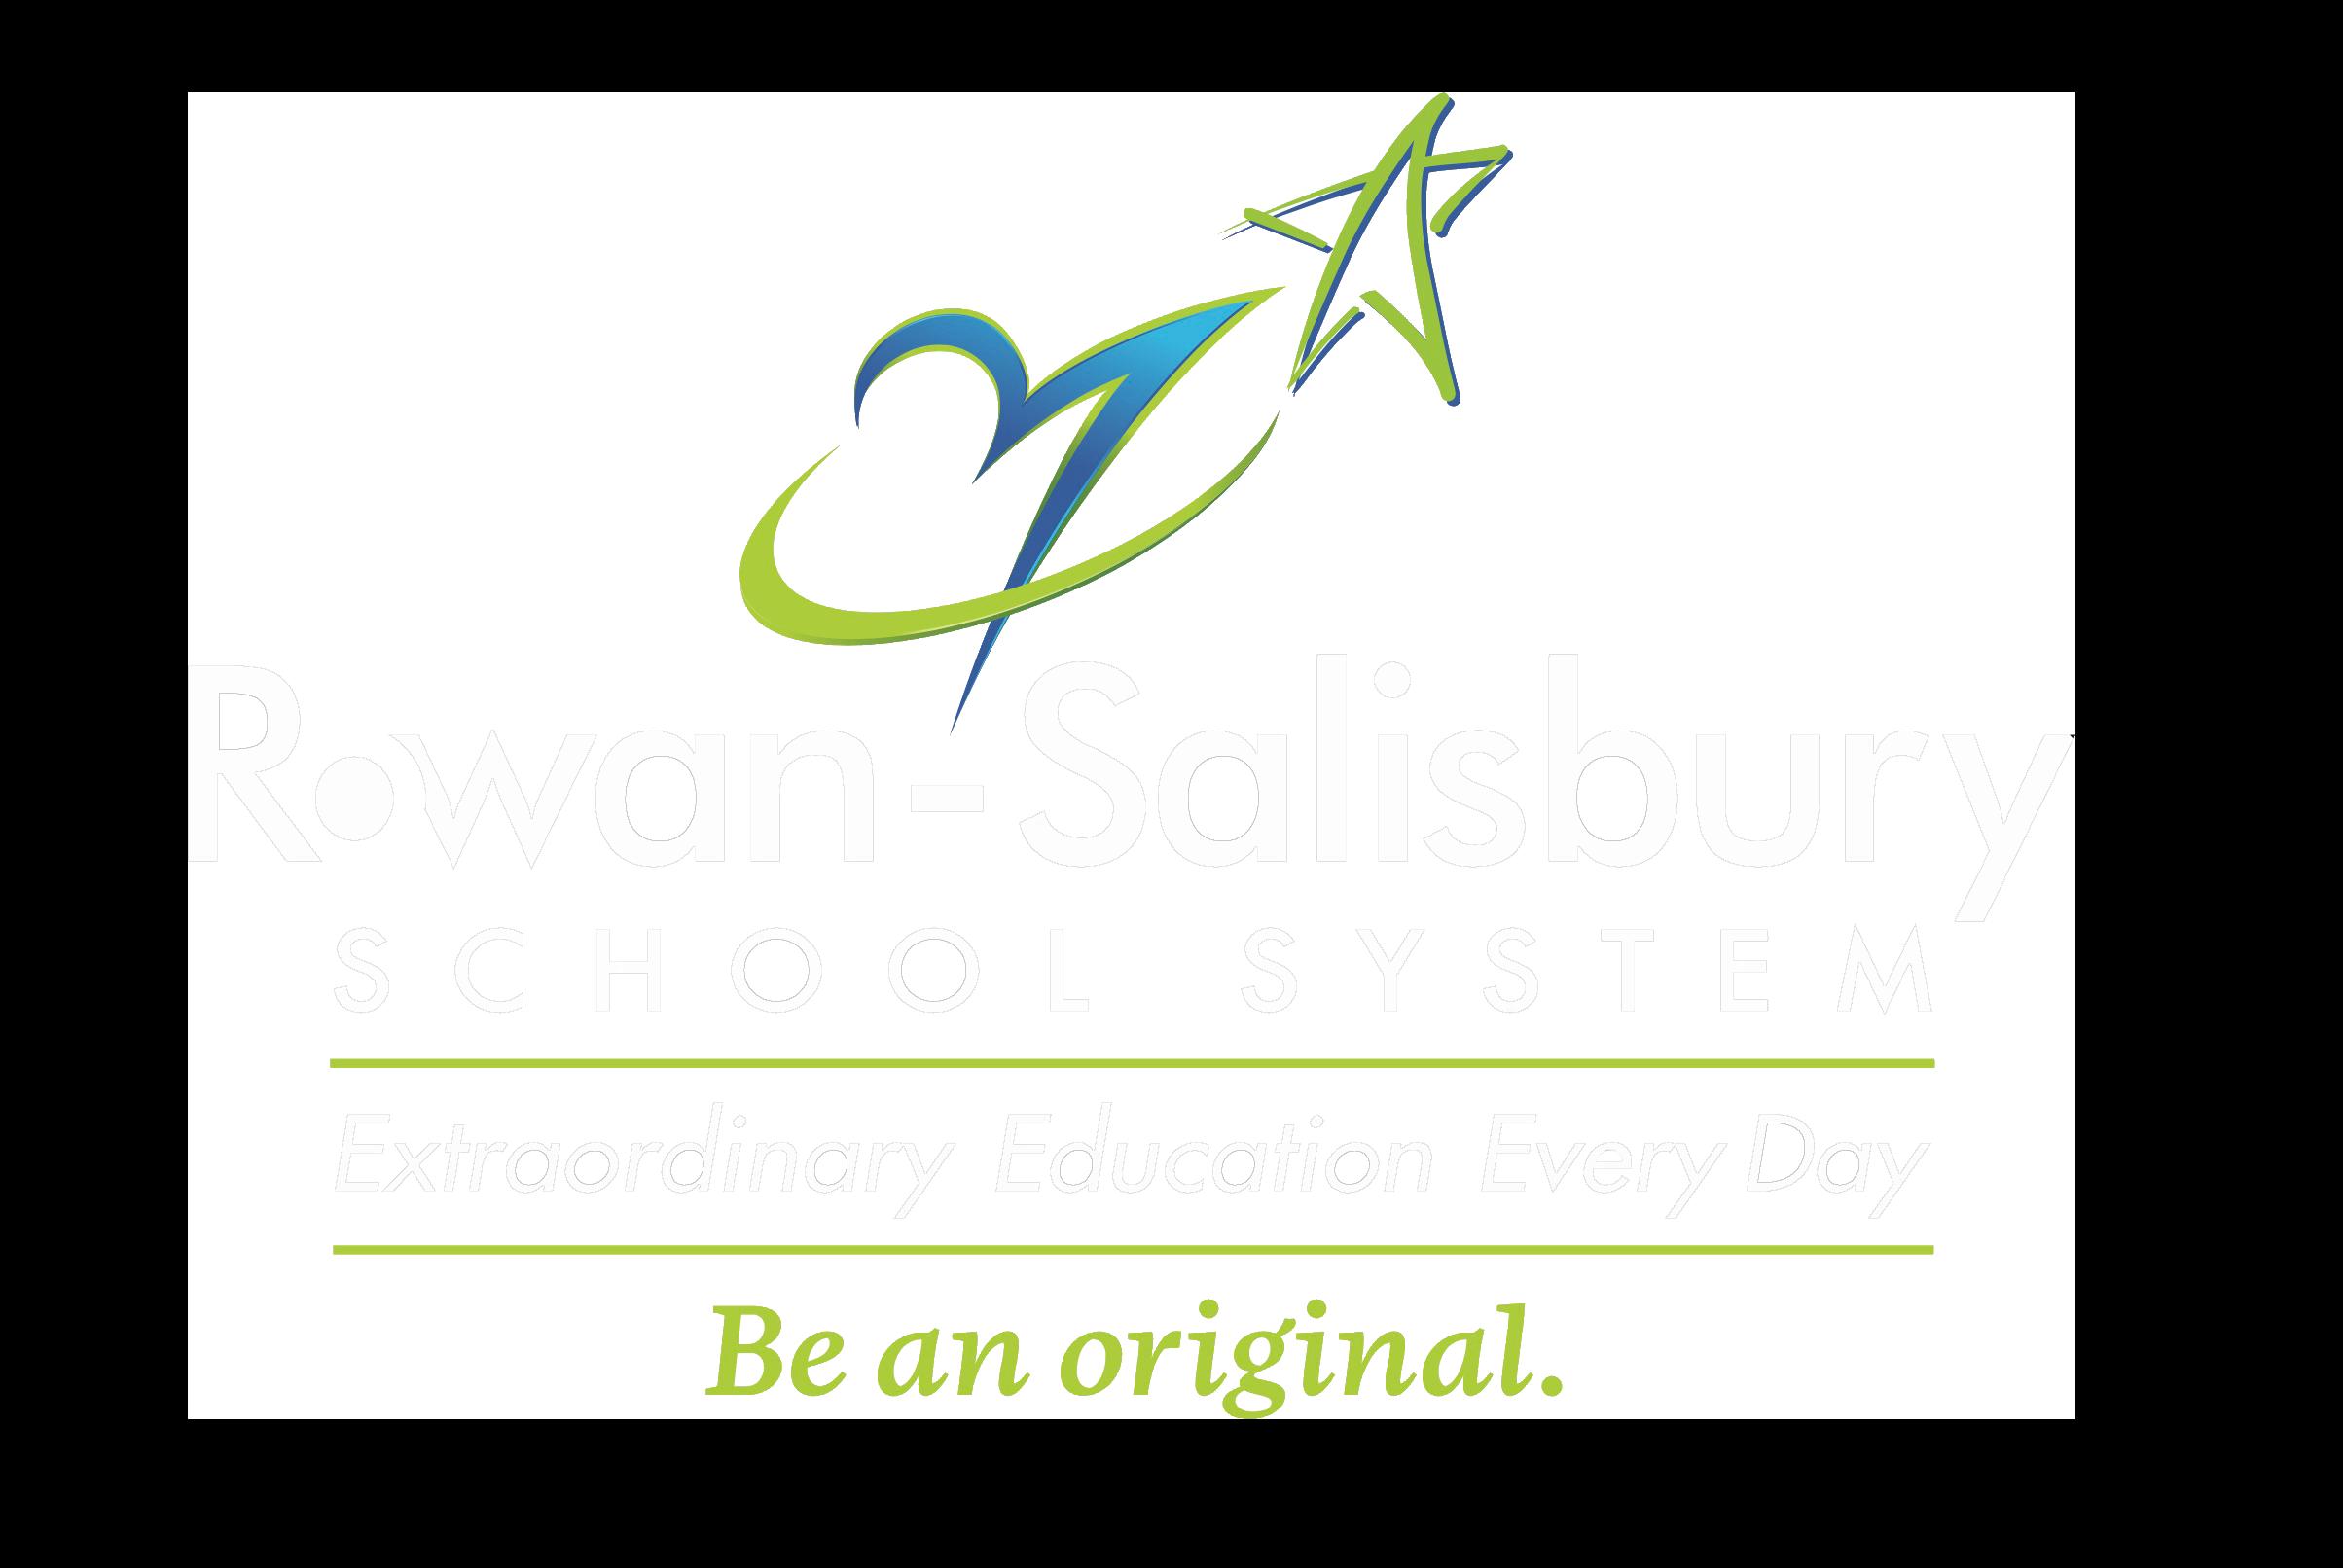 New Rowan-Salisbury Schools Enrollment